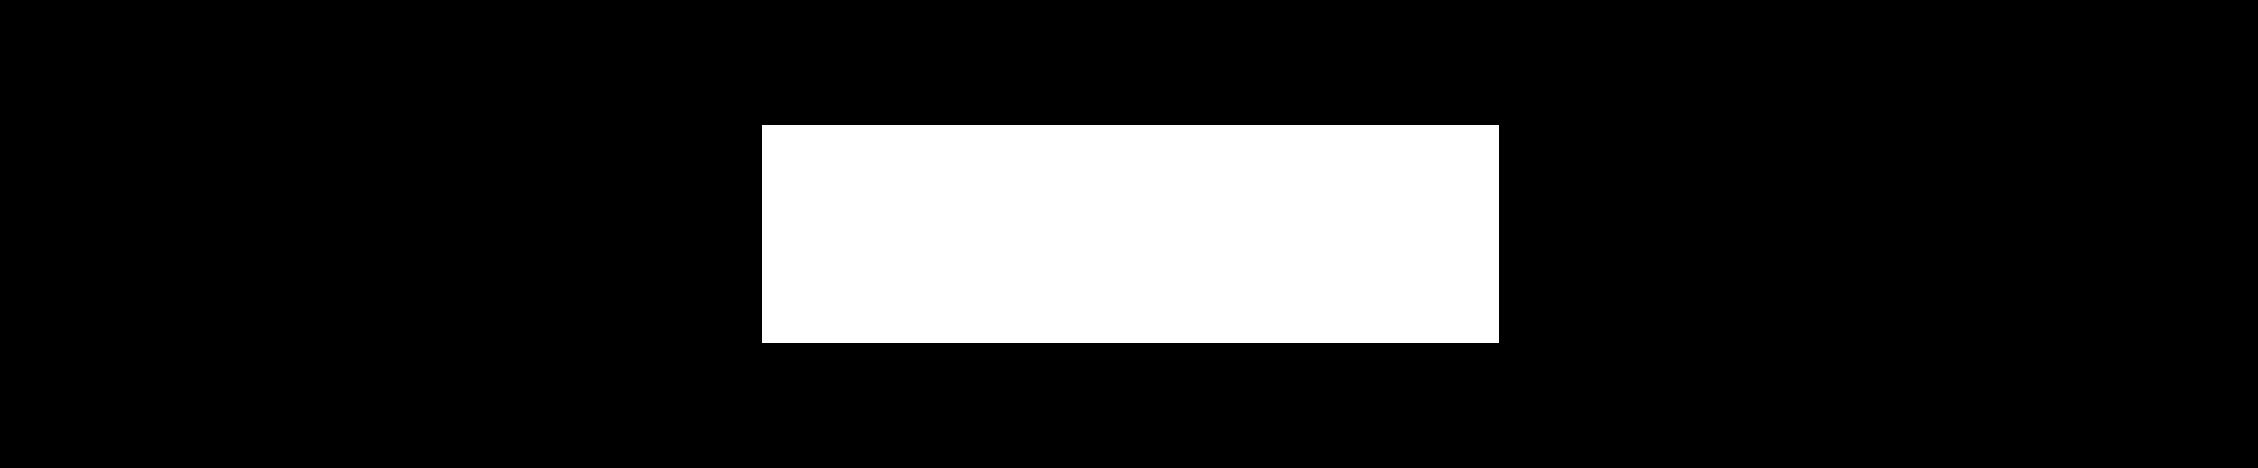 tedx-logo 02.png